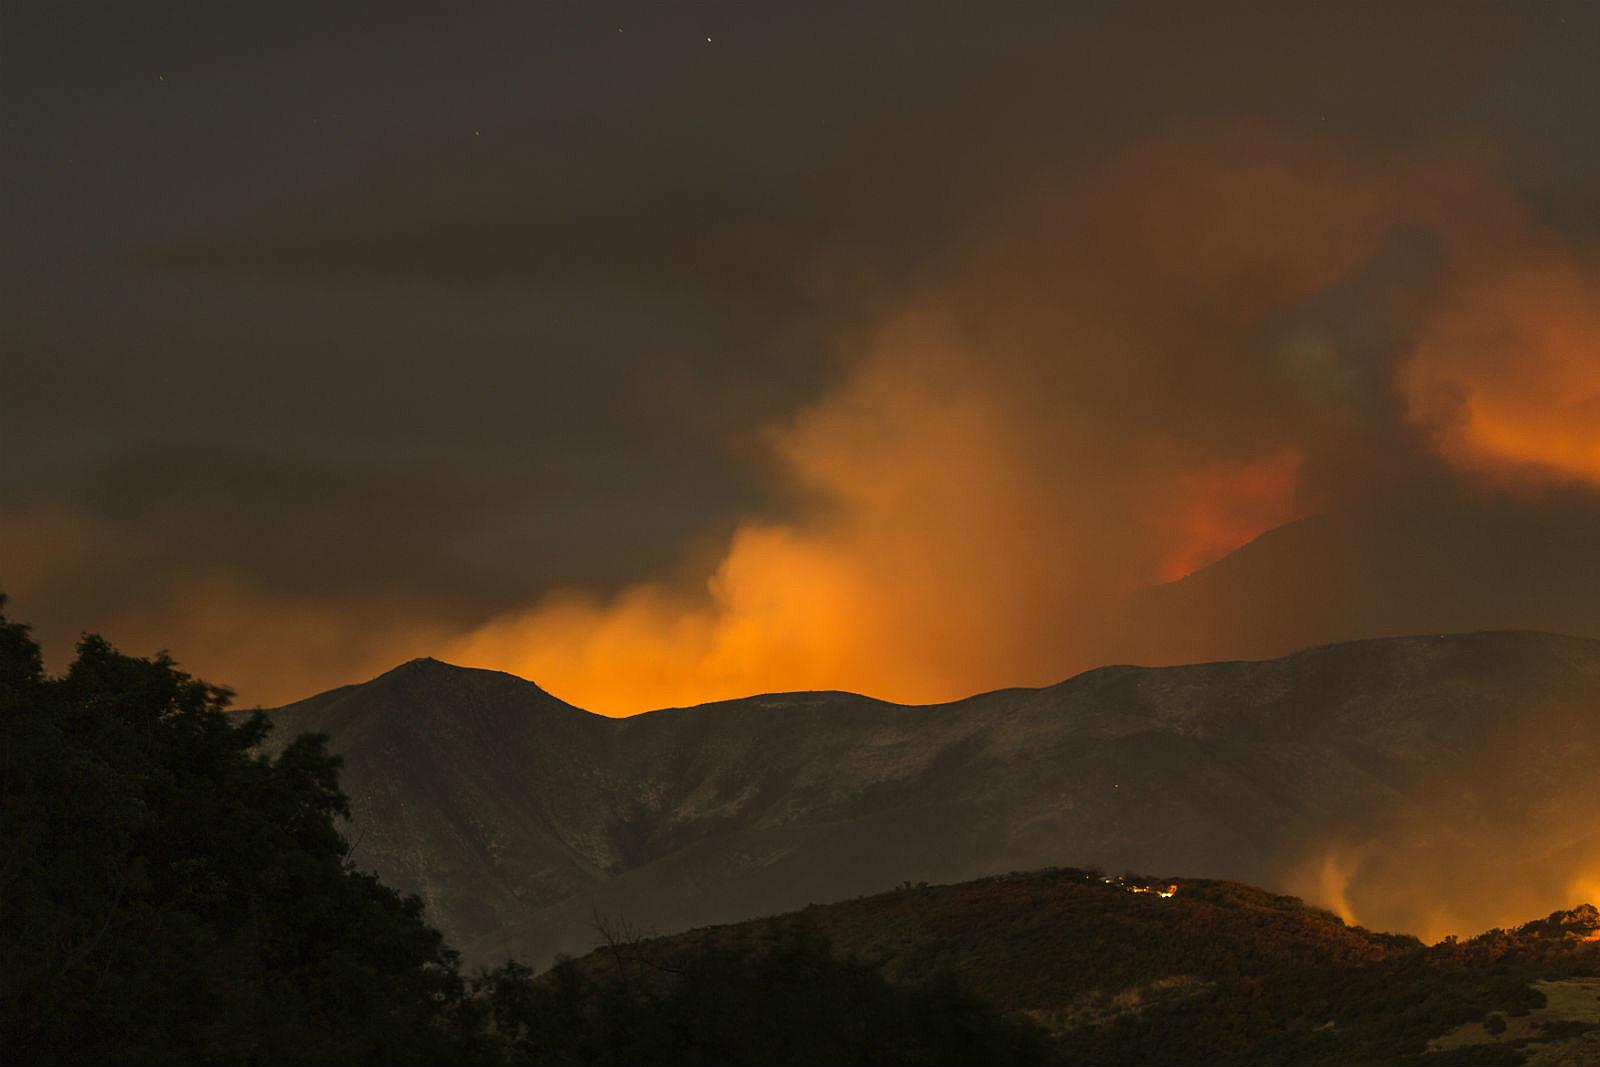 Wildfire_David McNew/Getty